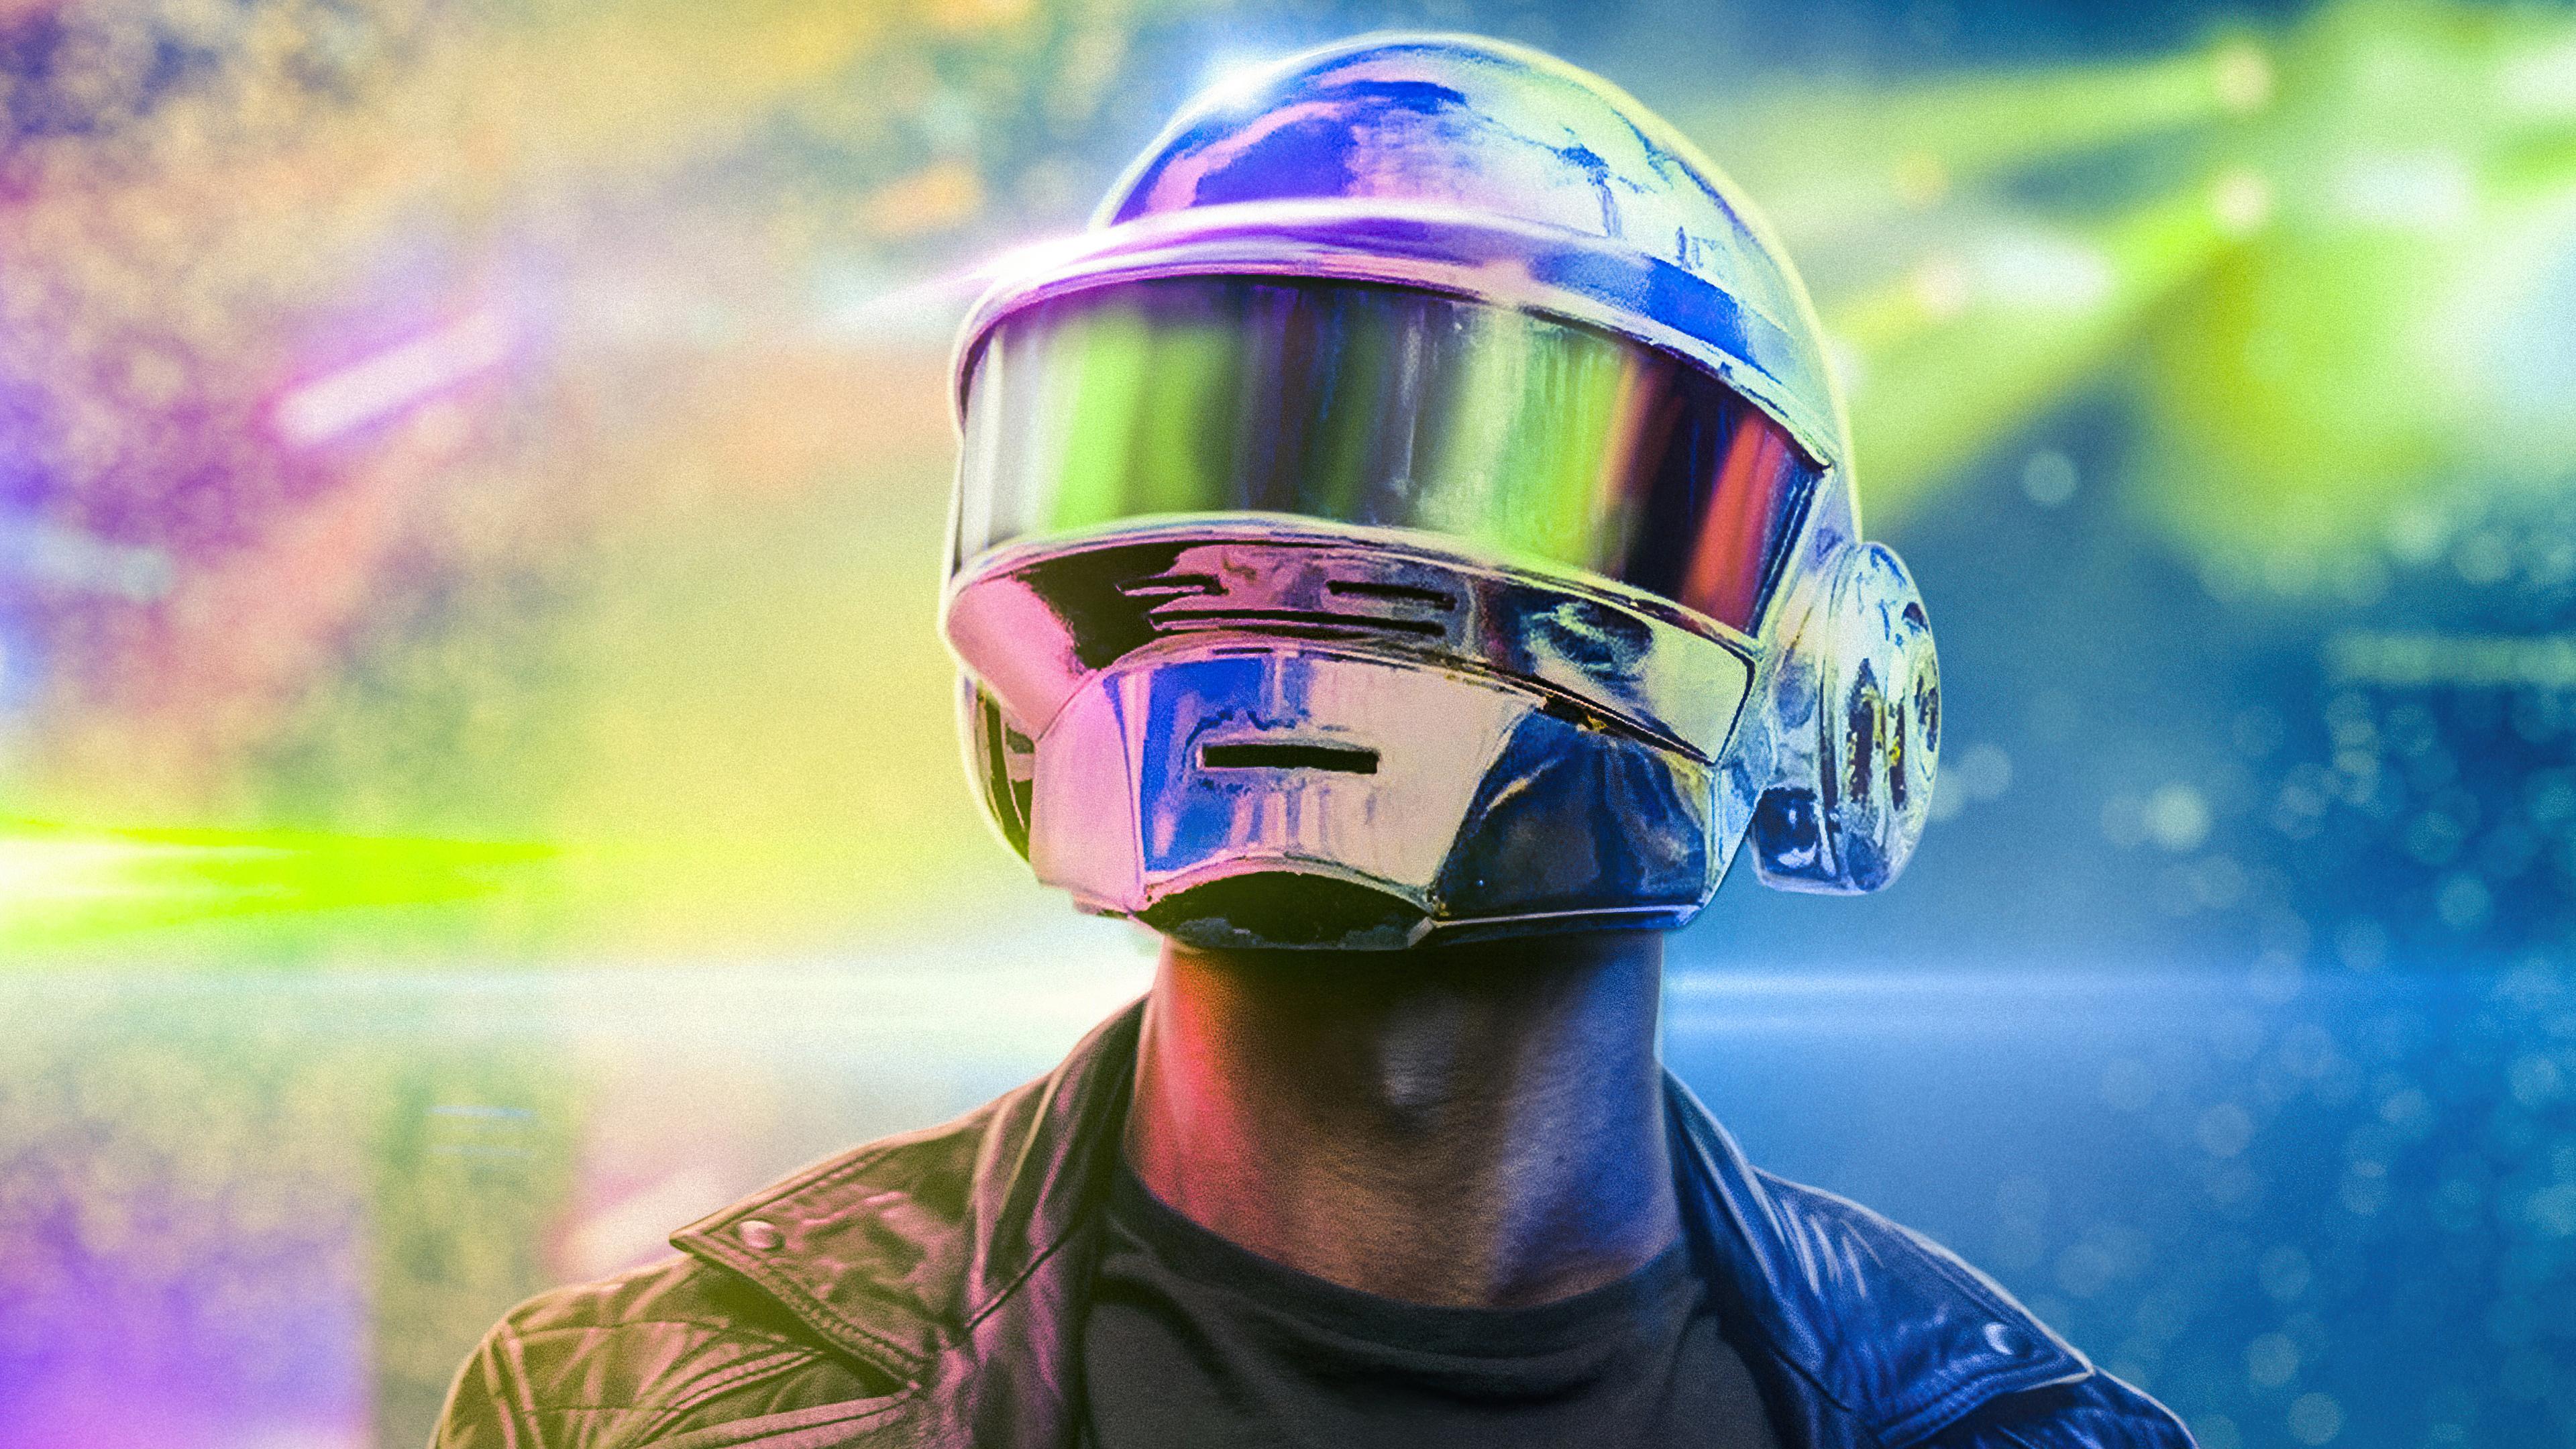 Fondos de pantalla Casco de Daft Punk